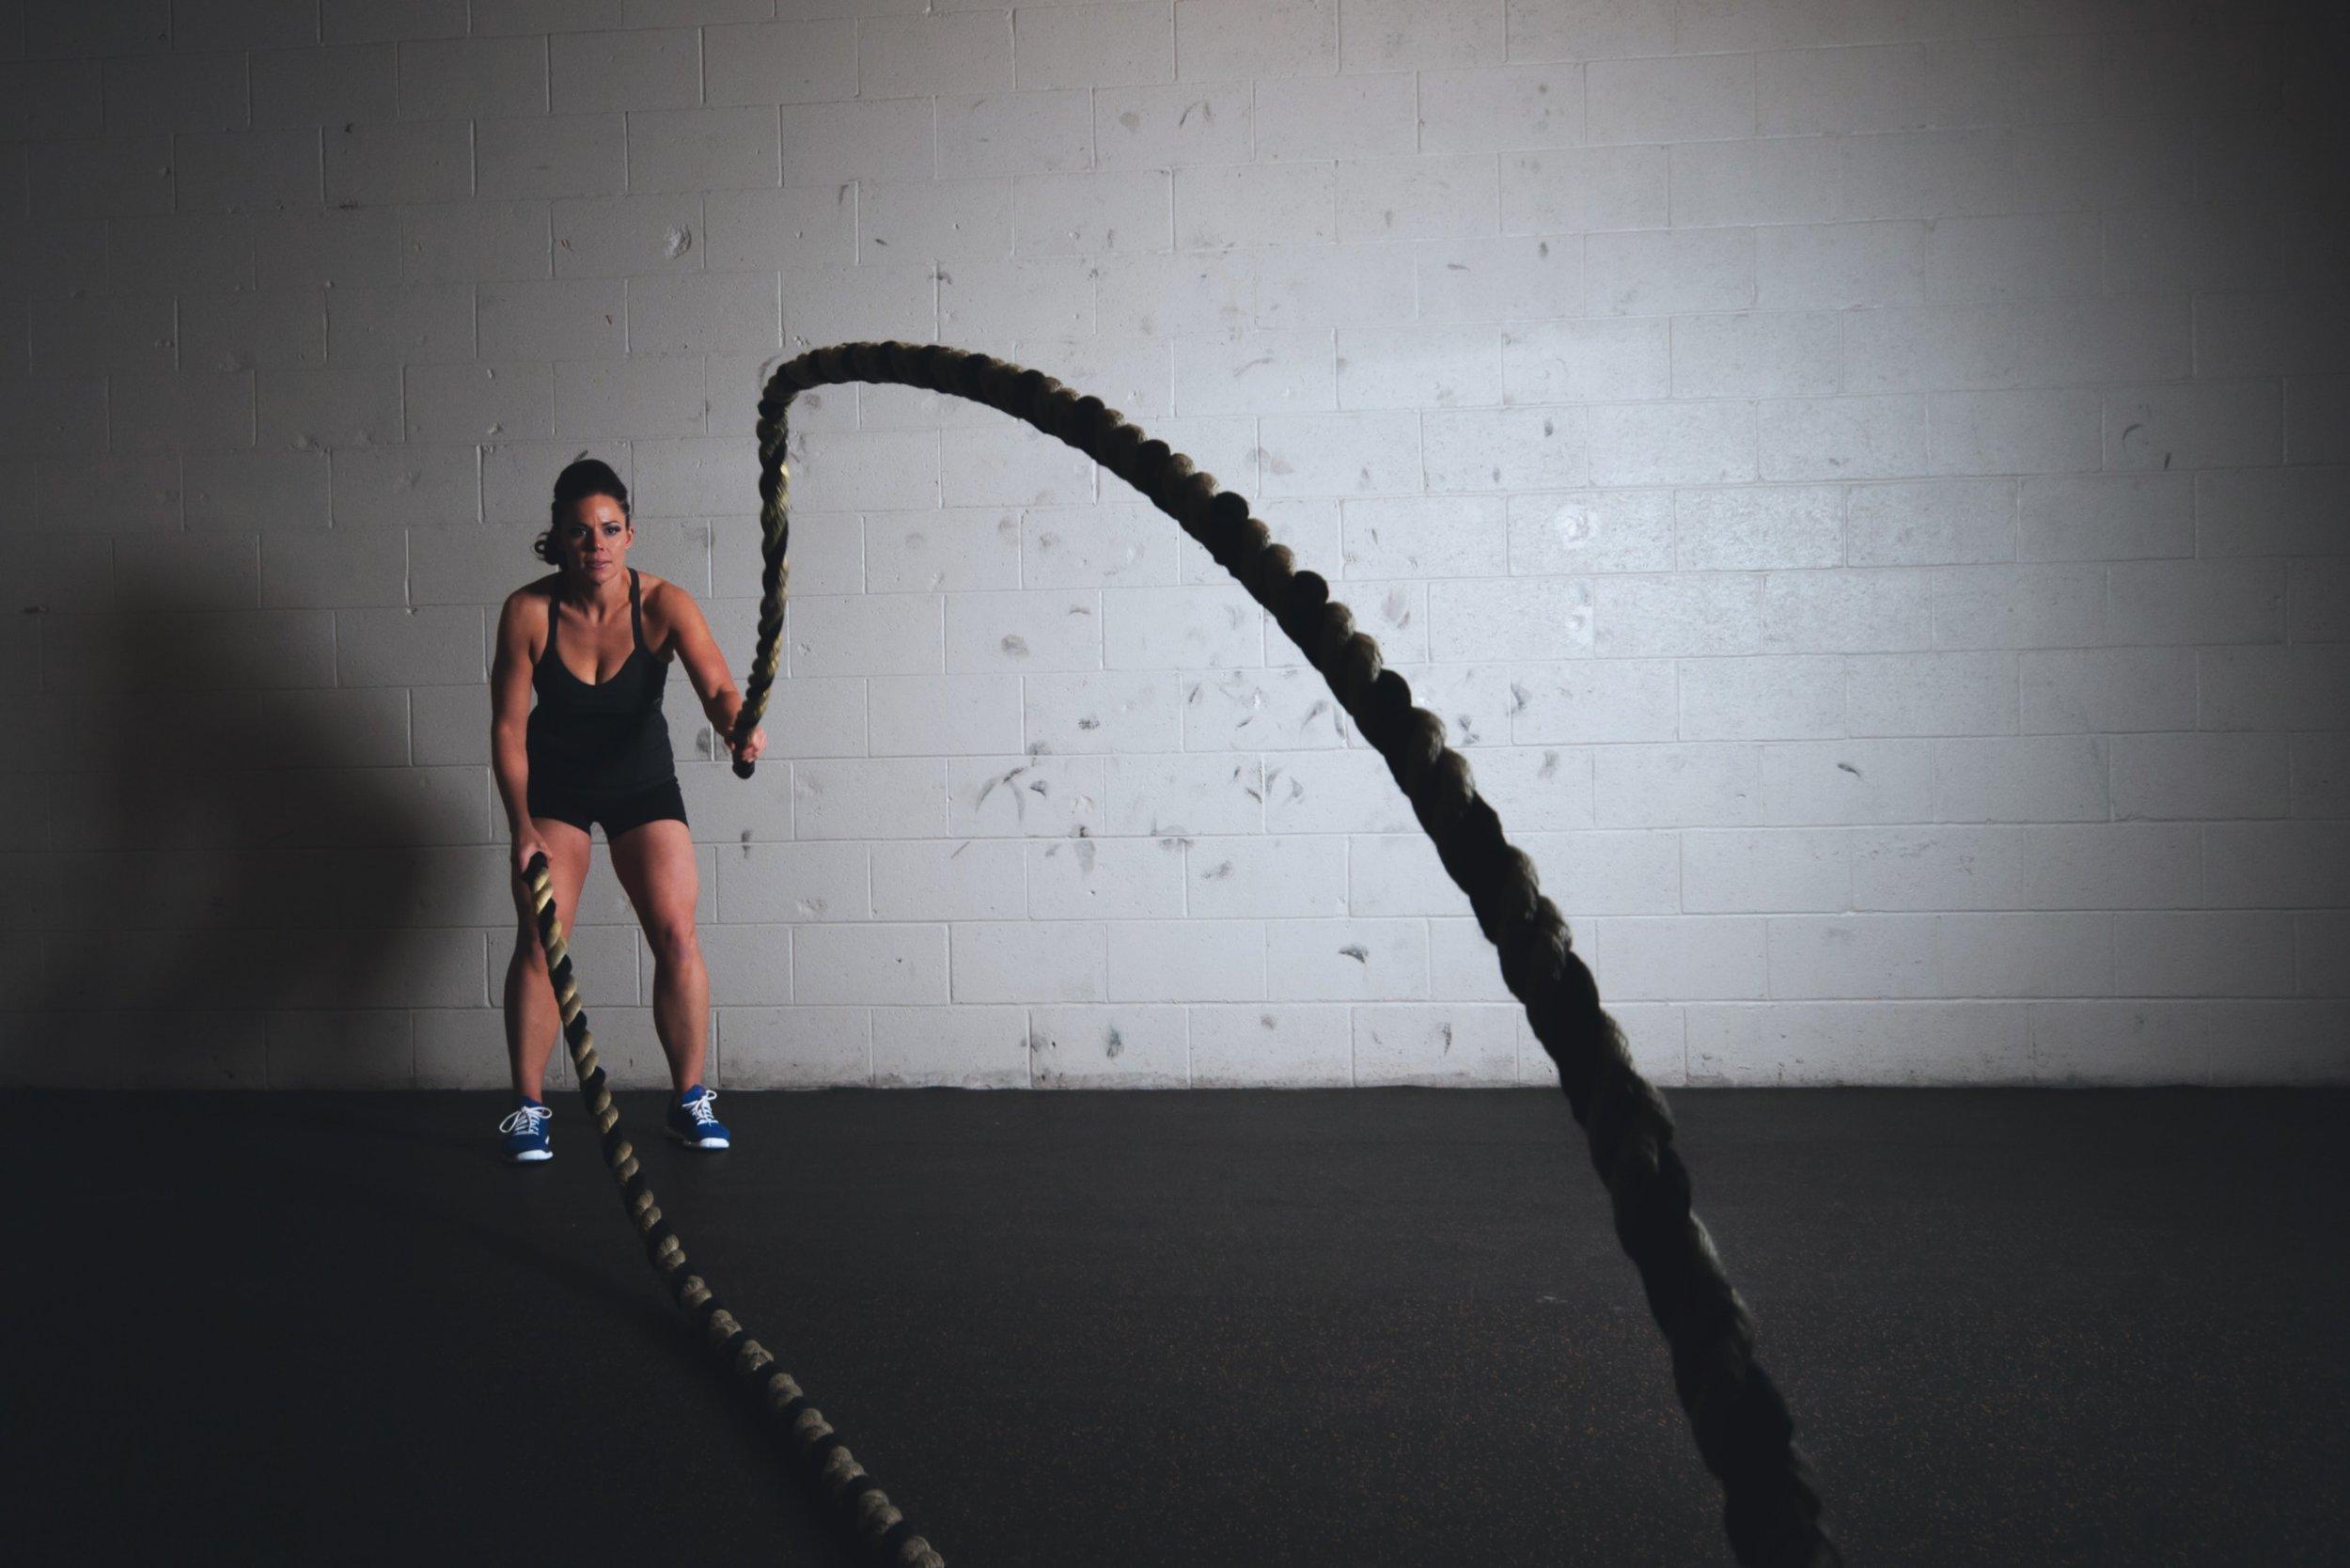 crossfit-exercise-fitness-28080.jpg